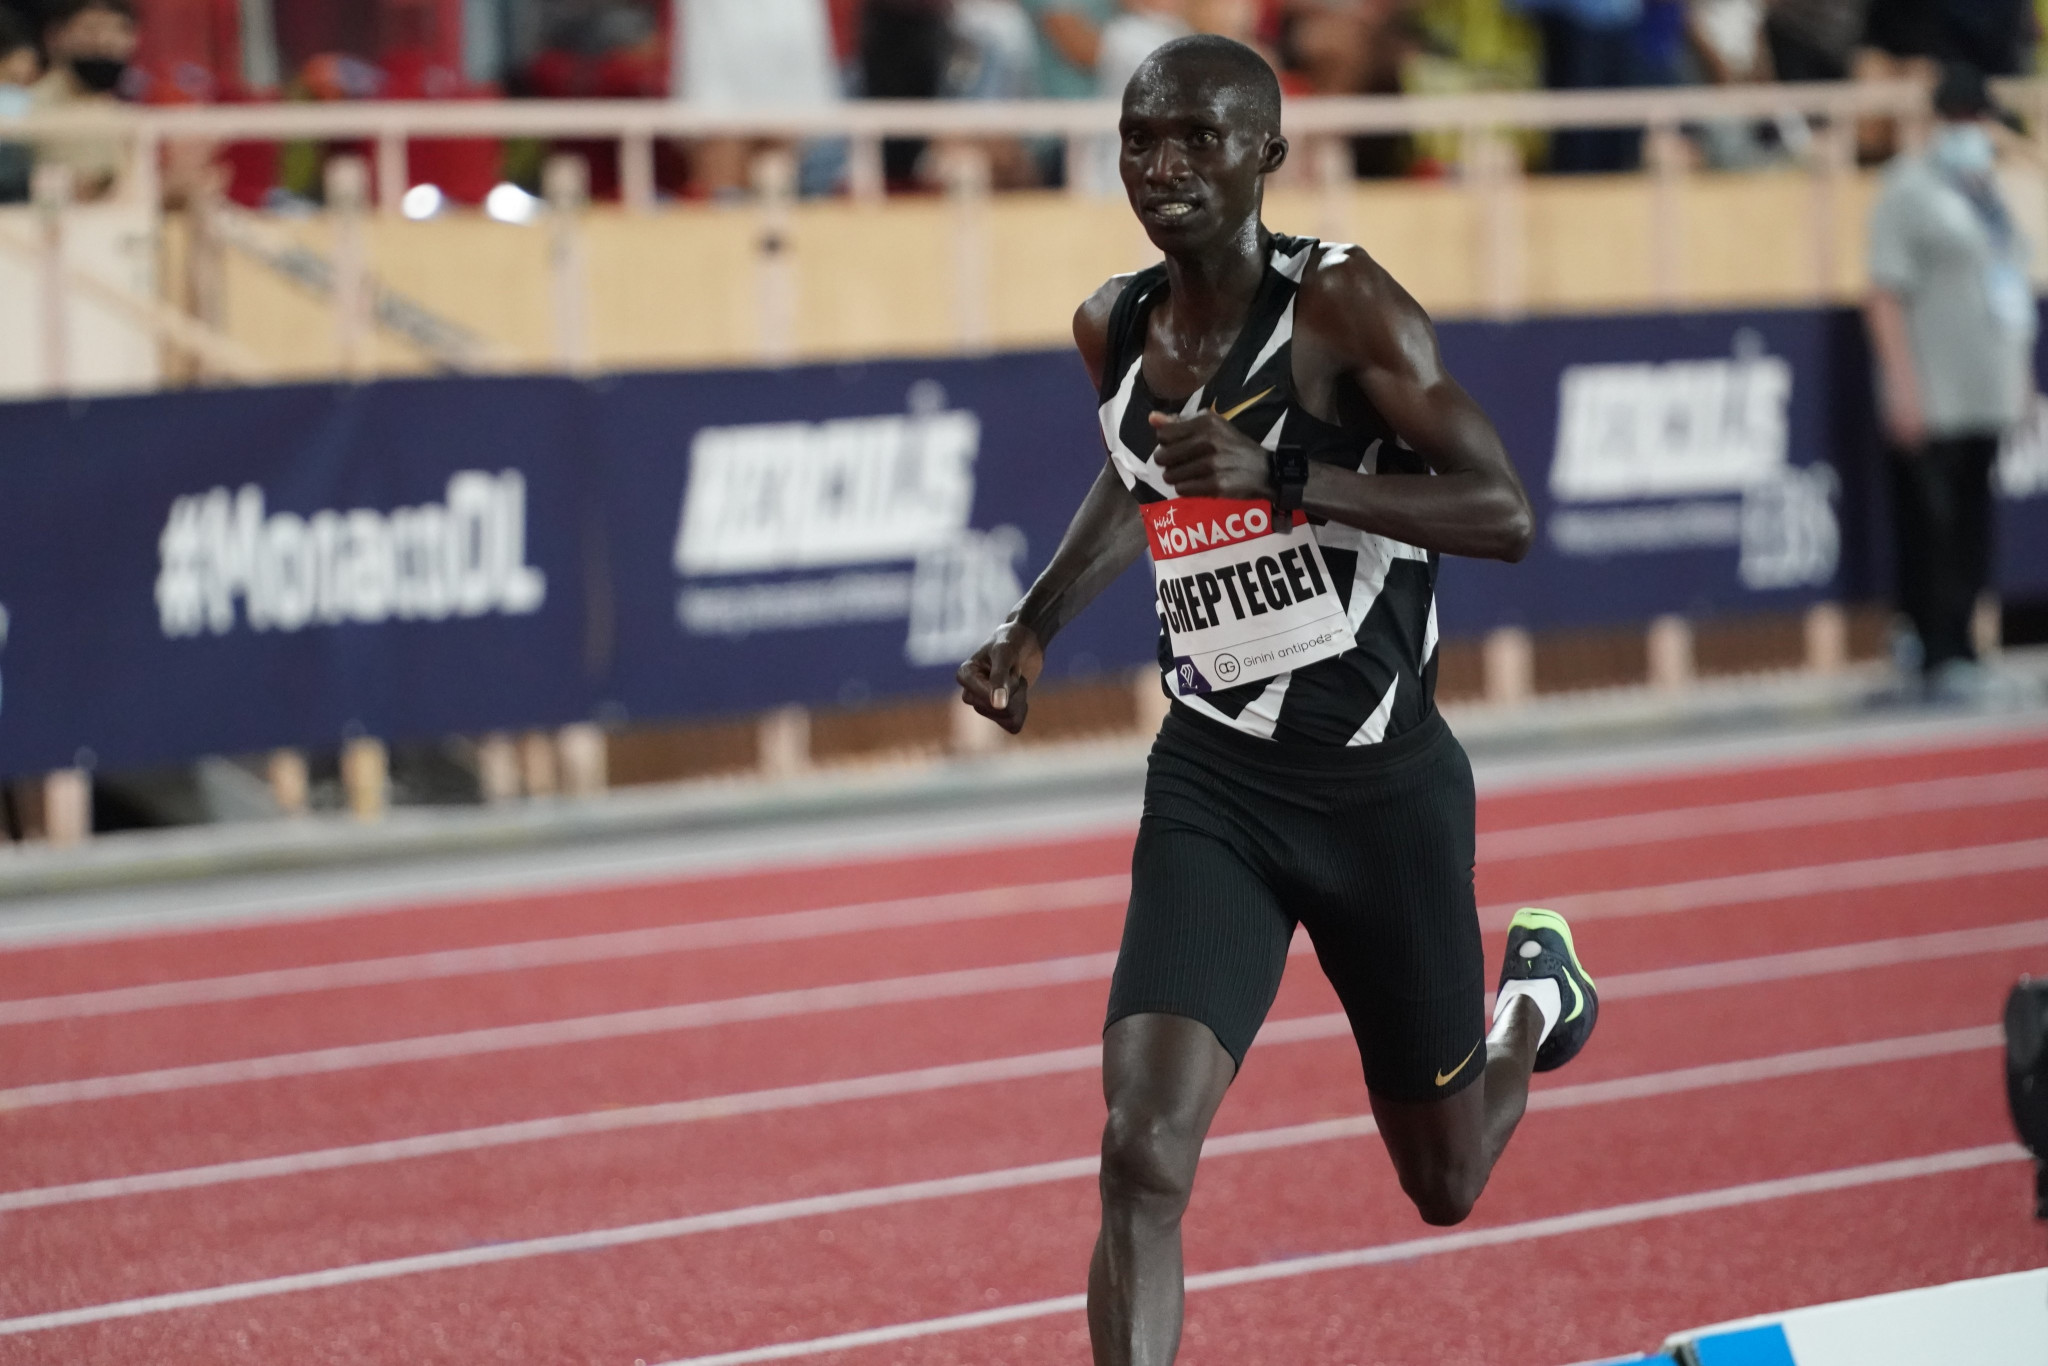 Cheptegei sets world 5,000m record as Wanda Diamond League opens in epic style in Monaco